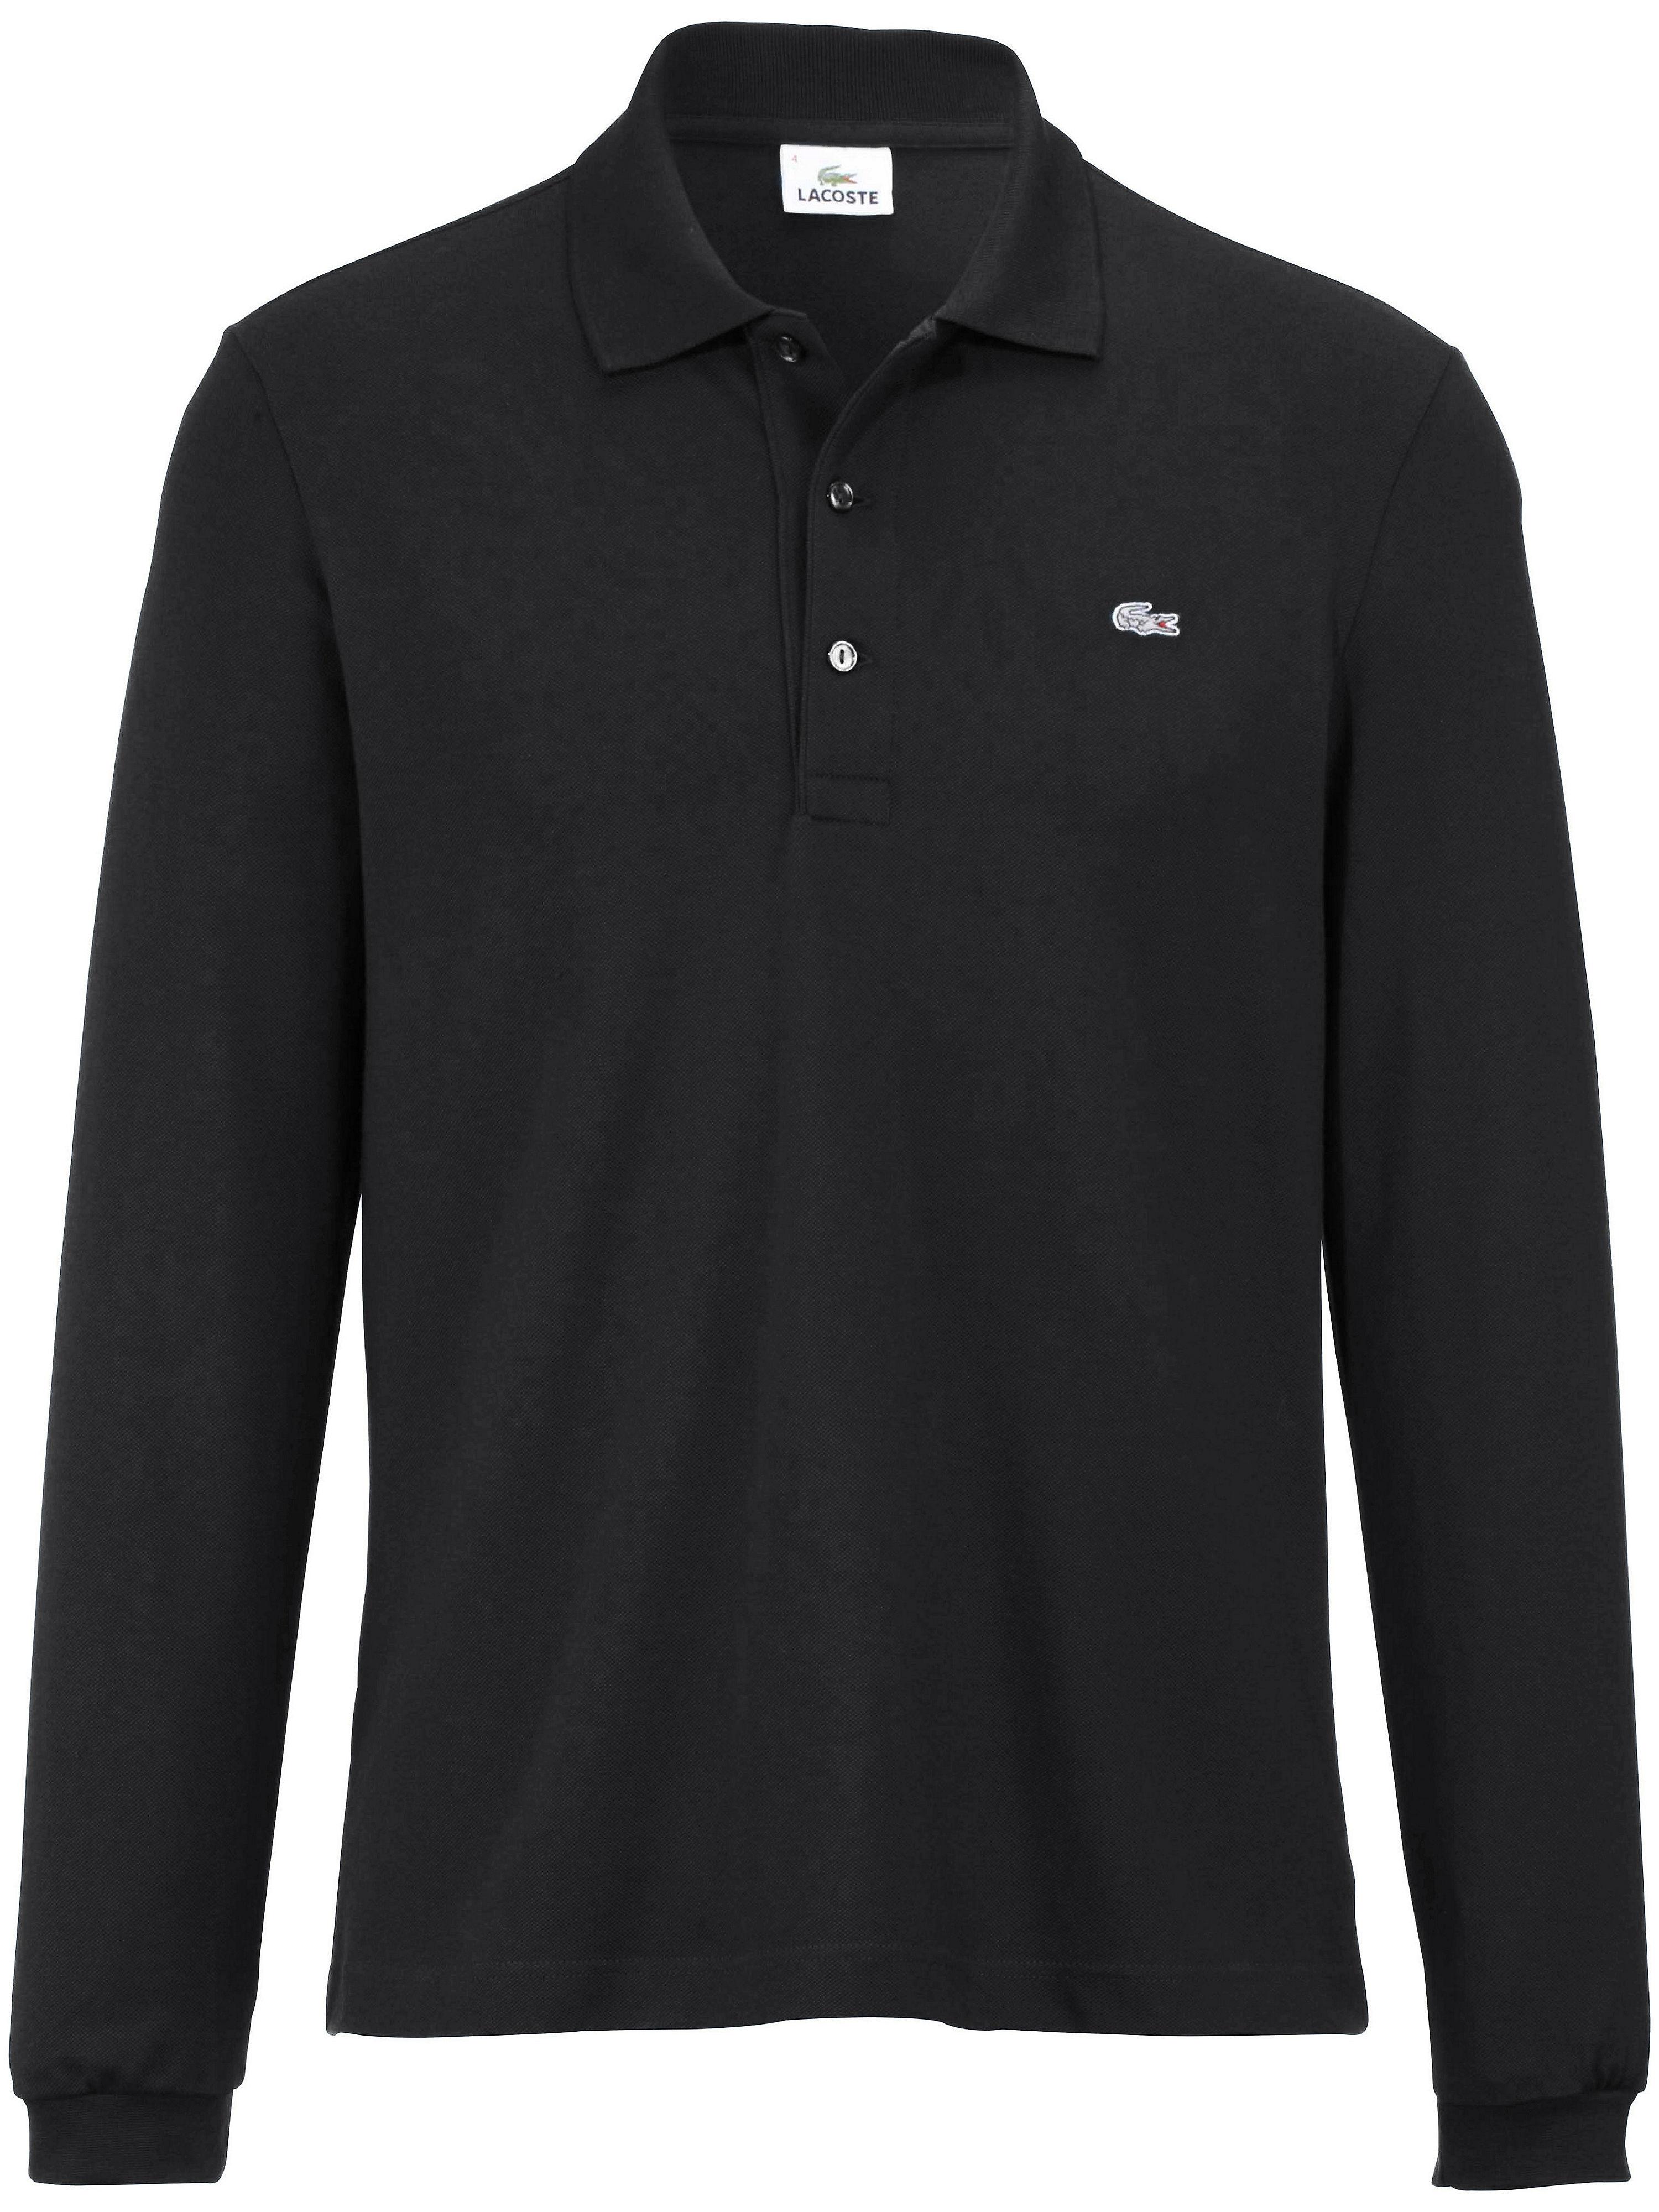 "Polo-Shirt ""Form PH4014´´ 1/2-Arm Lacoste schwarz"